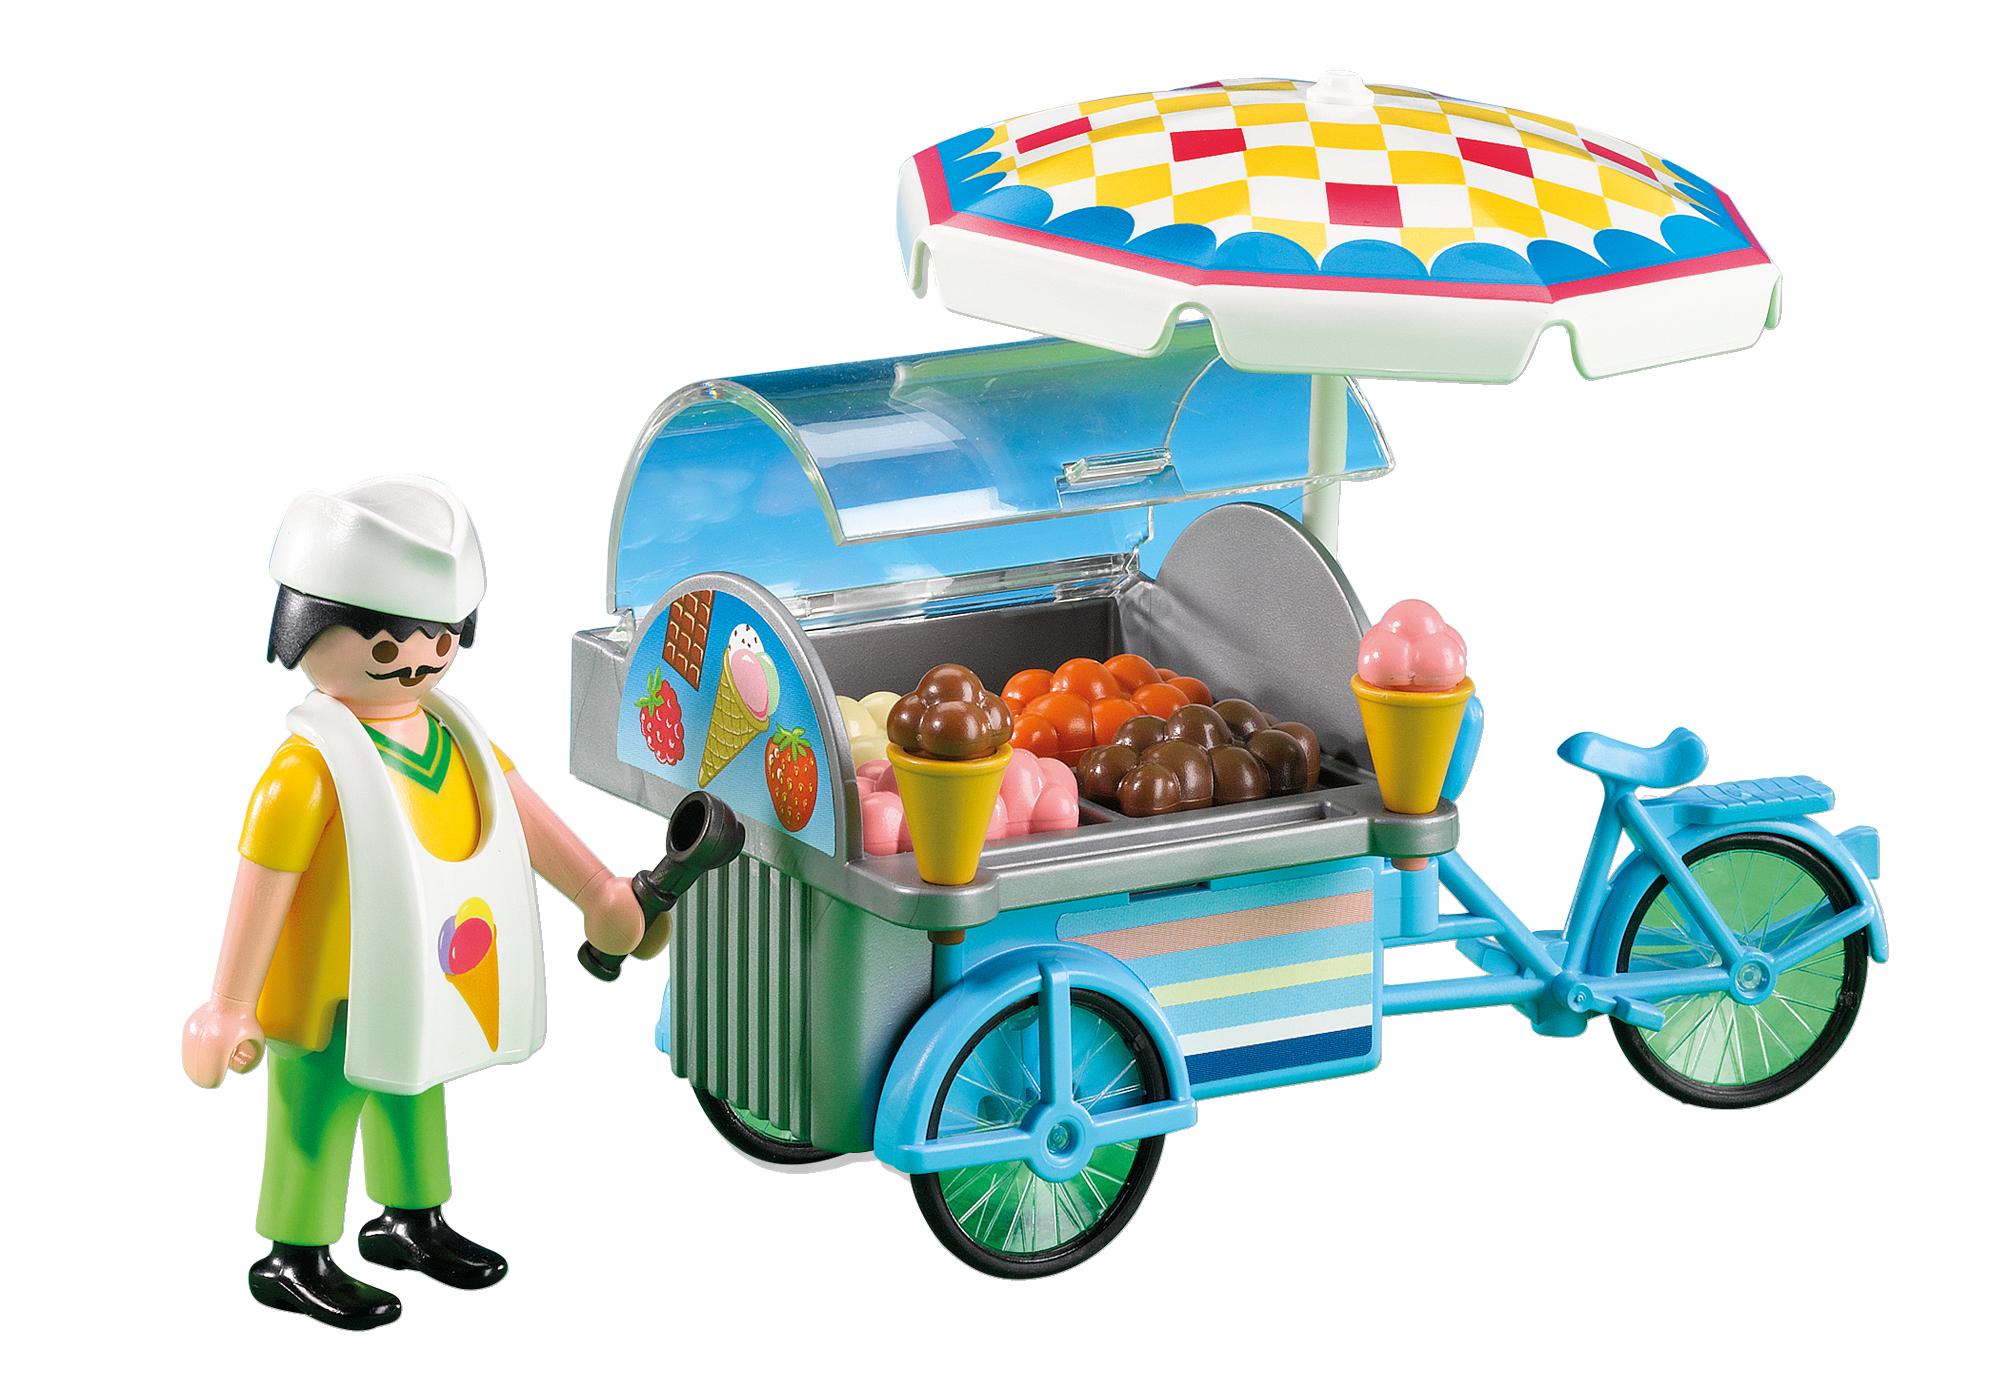 http://media.playmobil.com/i/playmobil/7492_product_detail